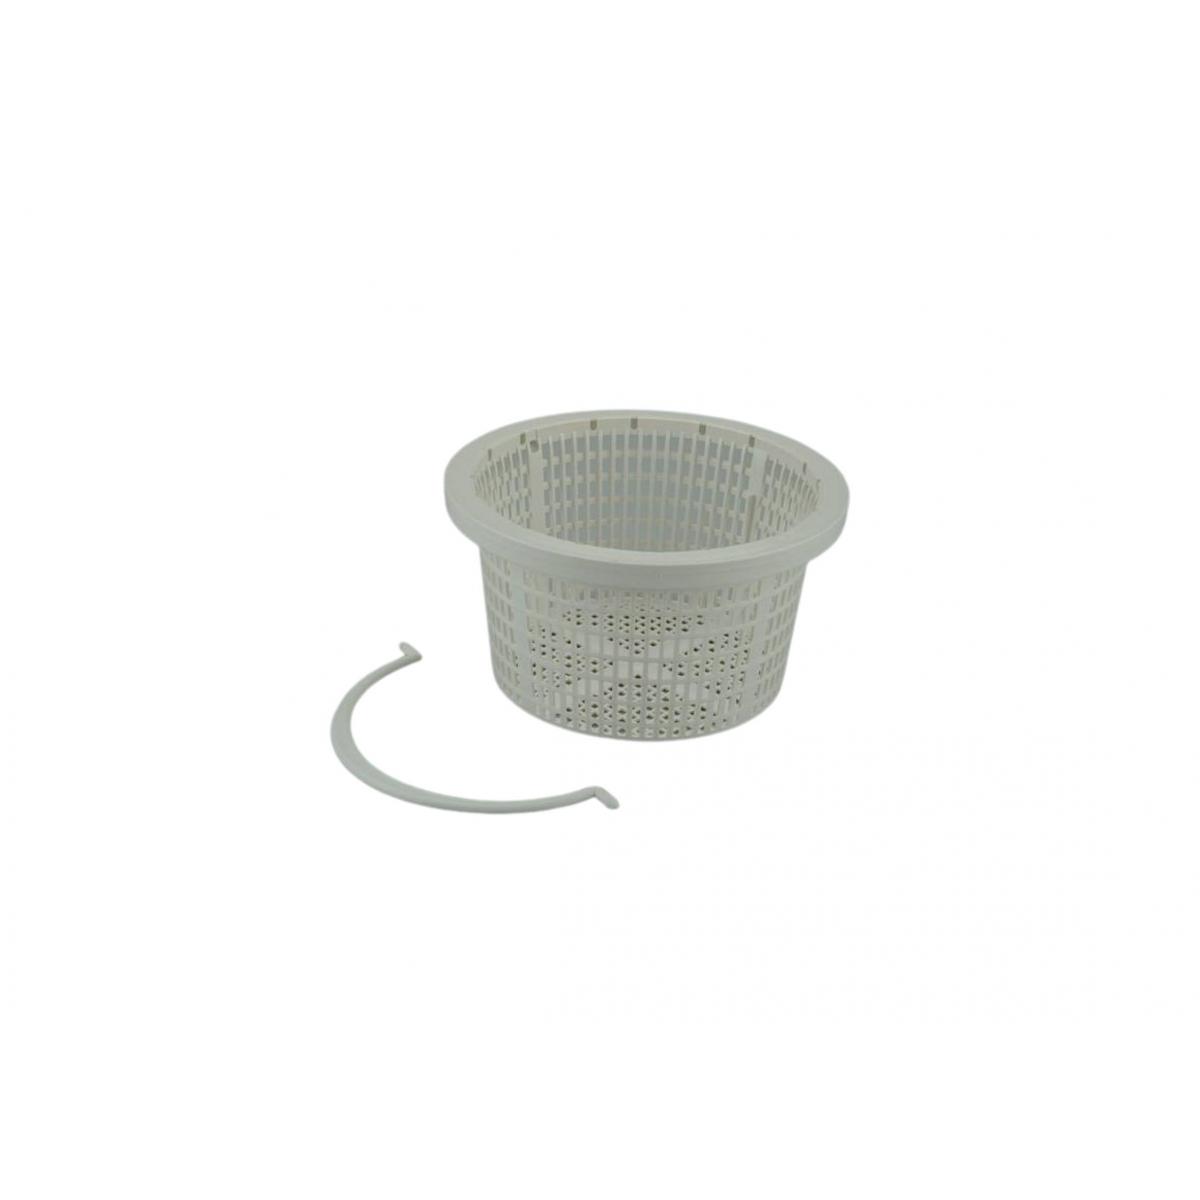 Cesto skimmer AstralPool 4402010103